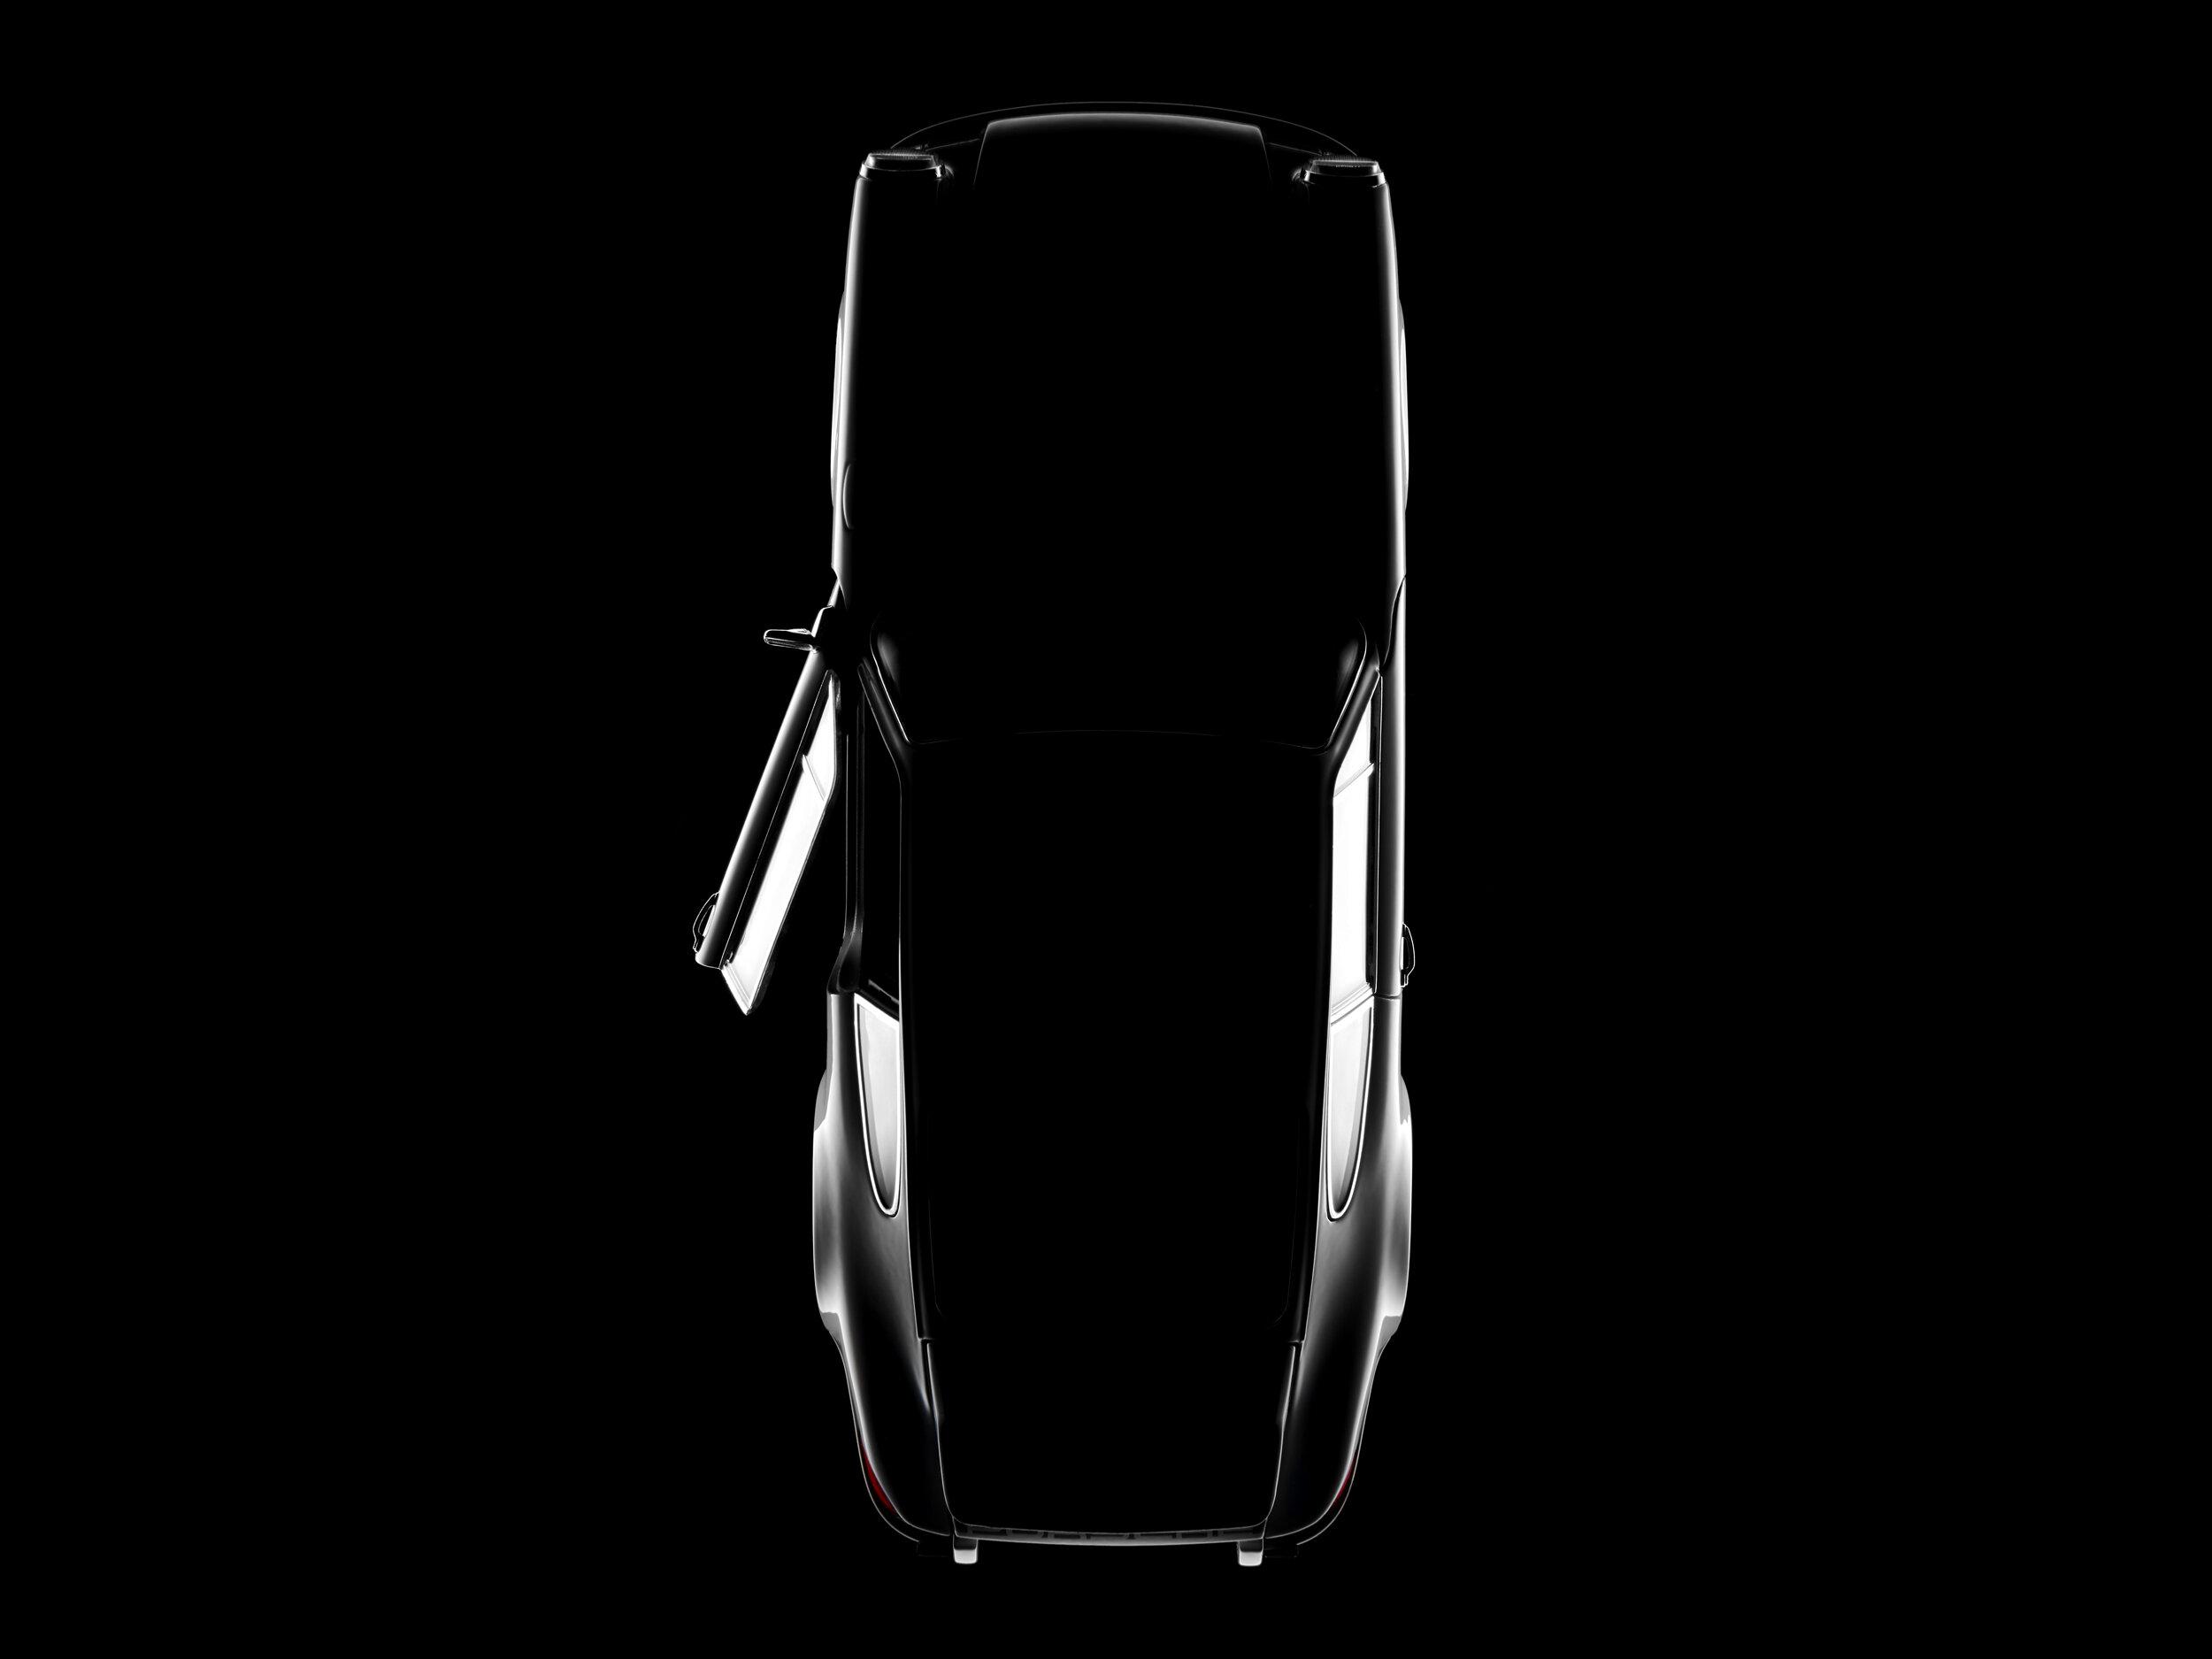 produktfotografie_Porsche-Carrera_1454.jpg